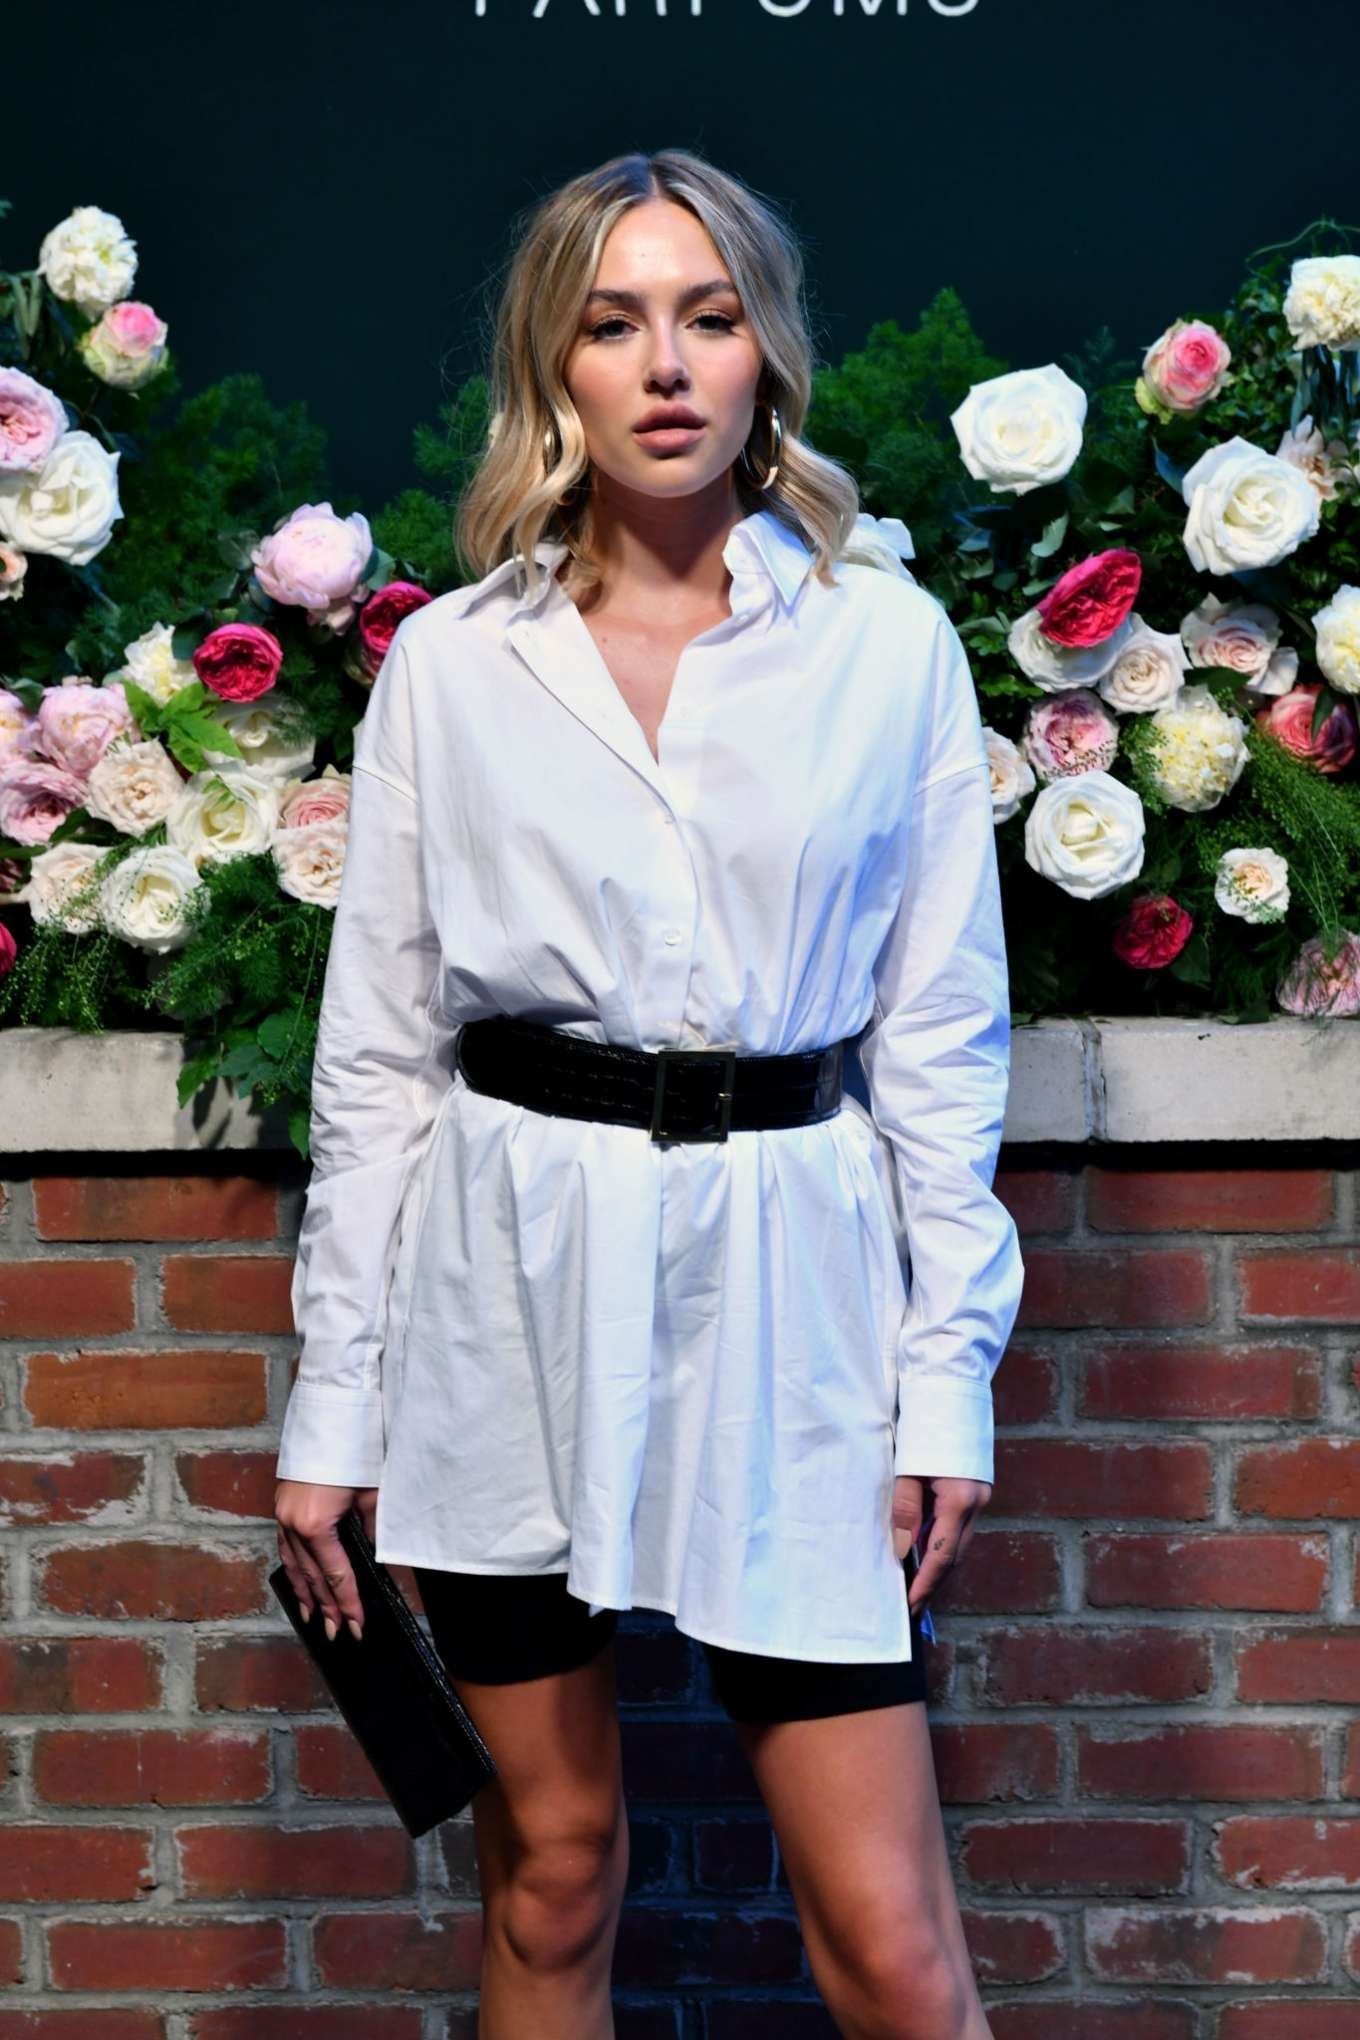 Delilah Belle Hamlin - Lily Aldridge Parfums Launch Event in NYC